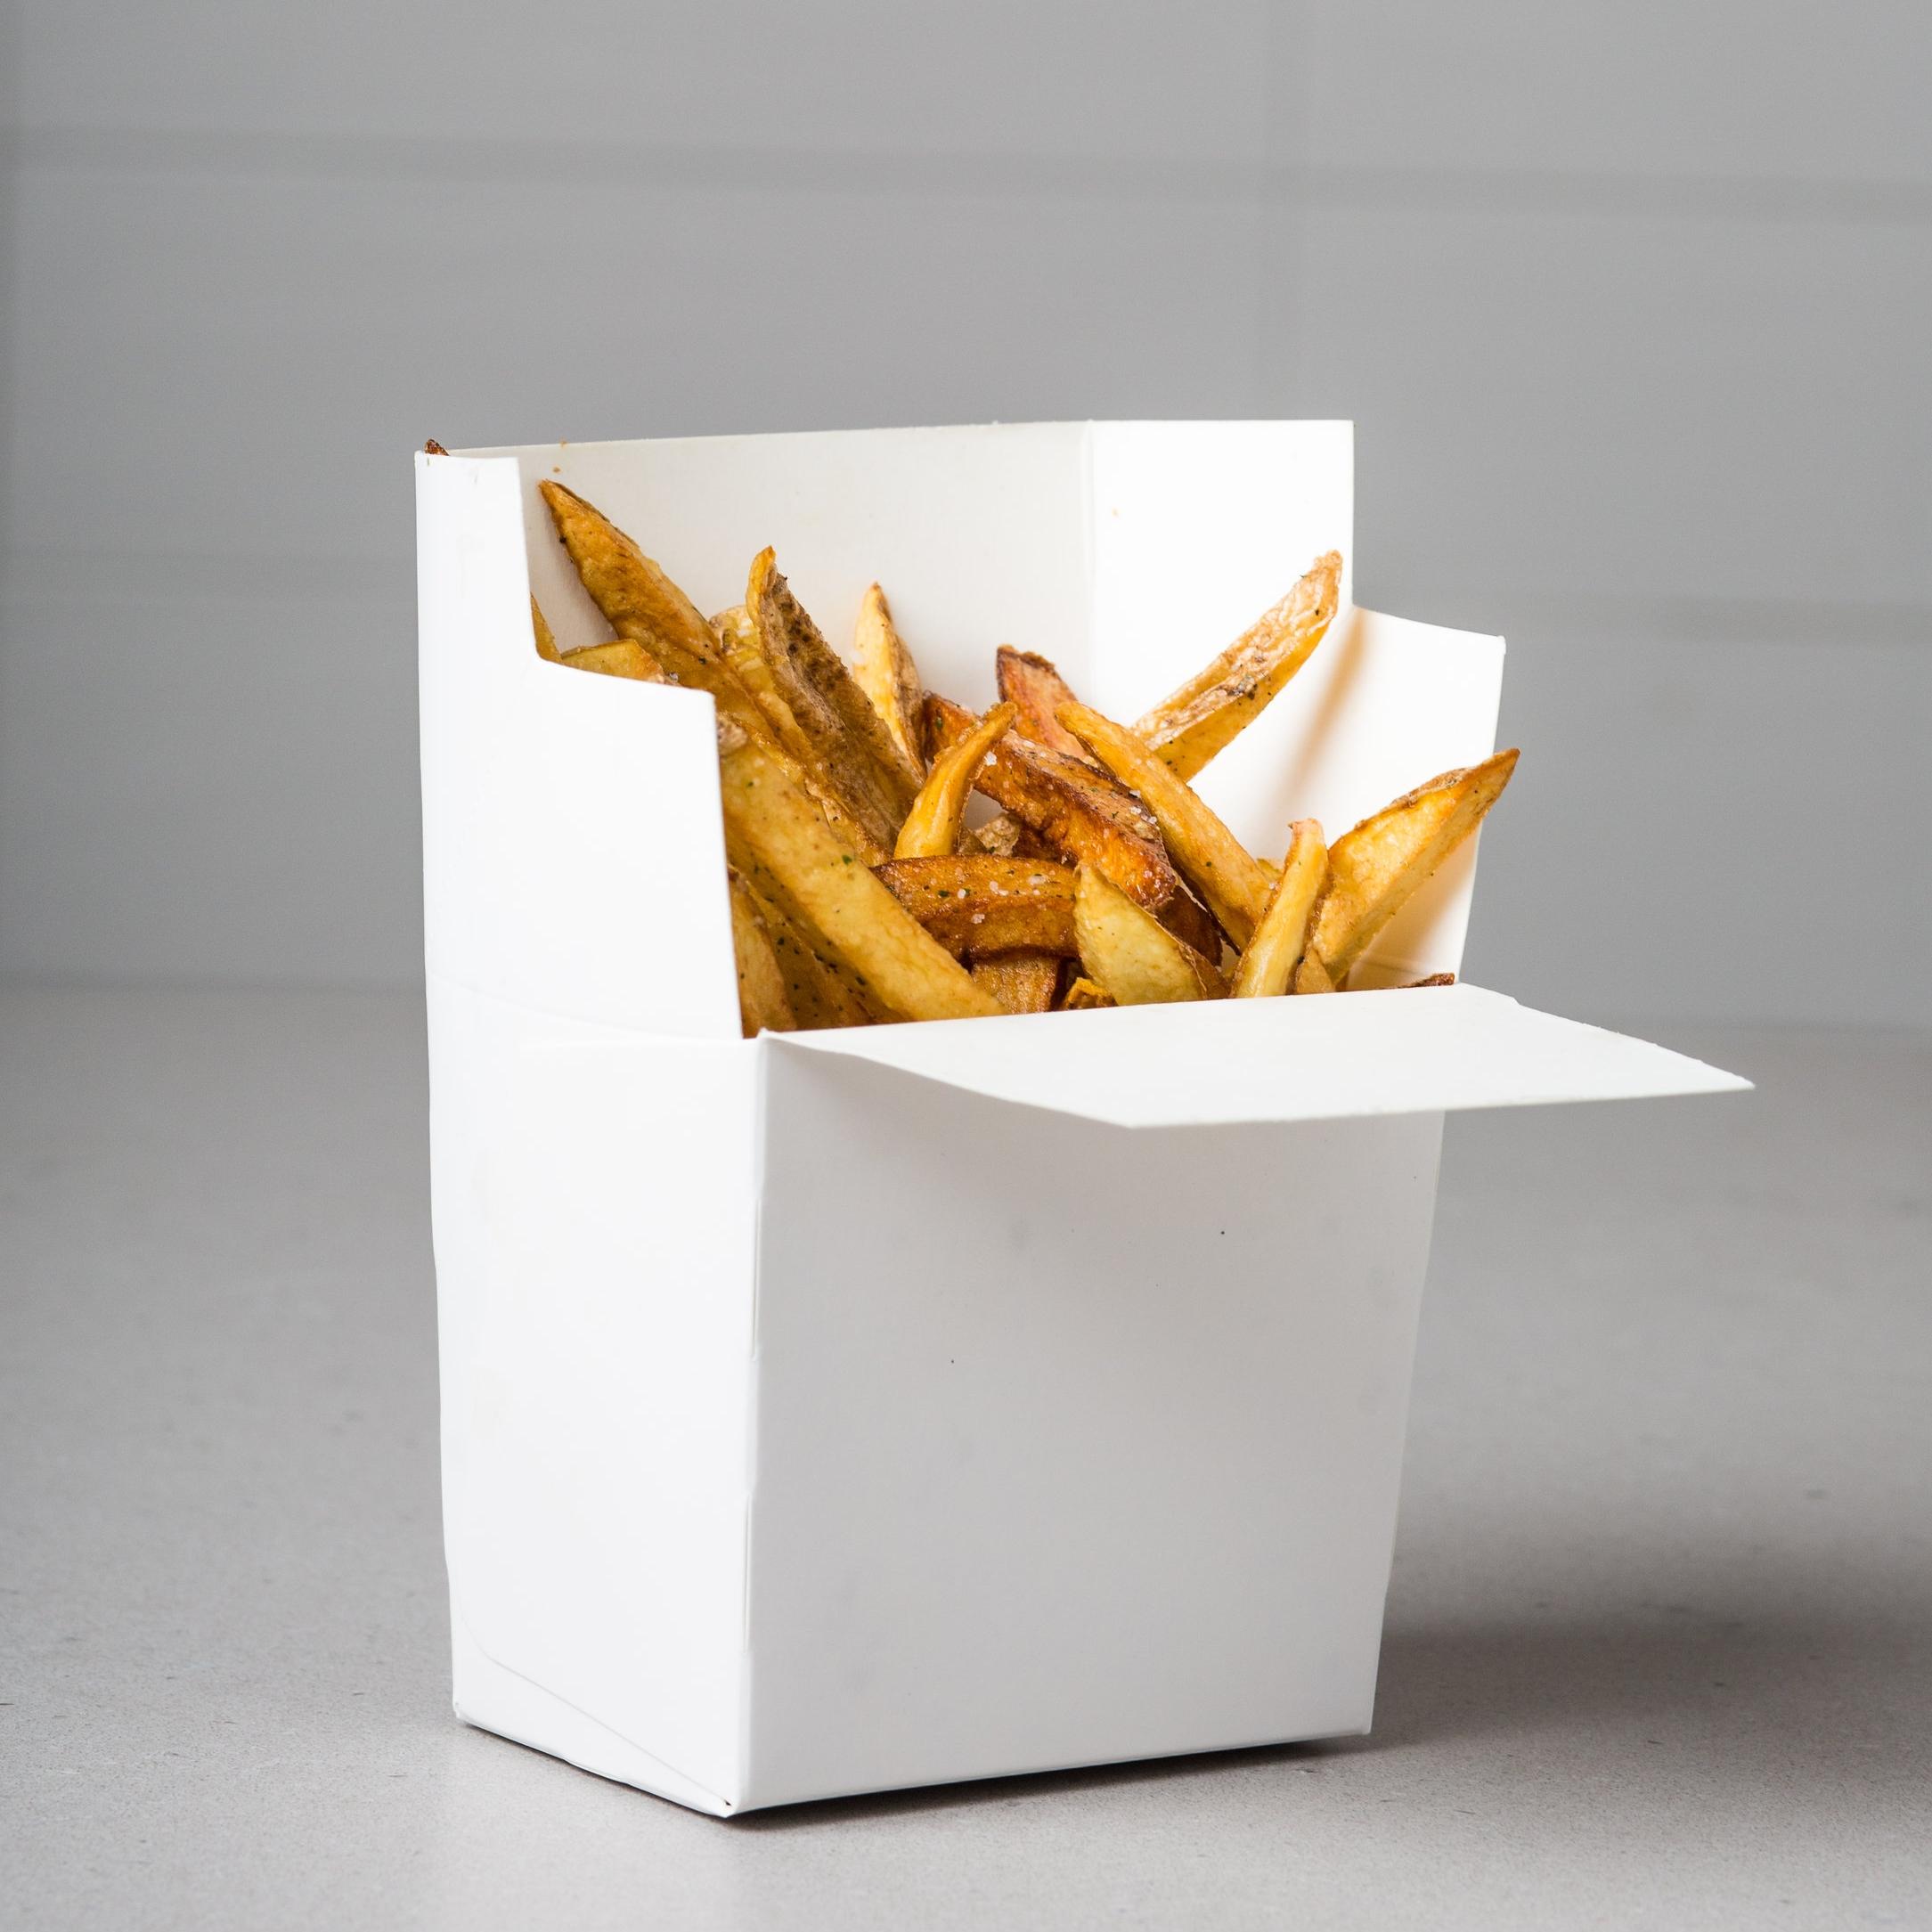 Fries - Parka Food Co.jpg